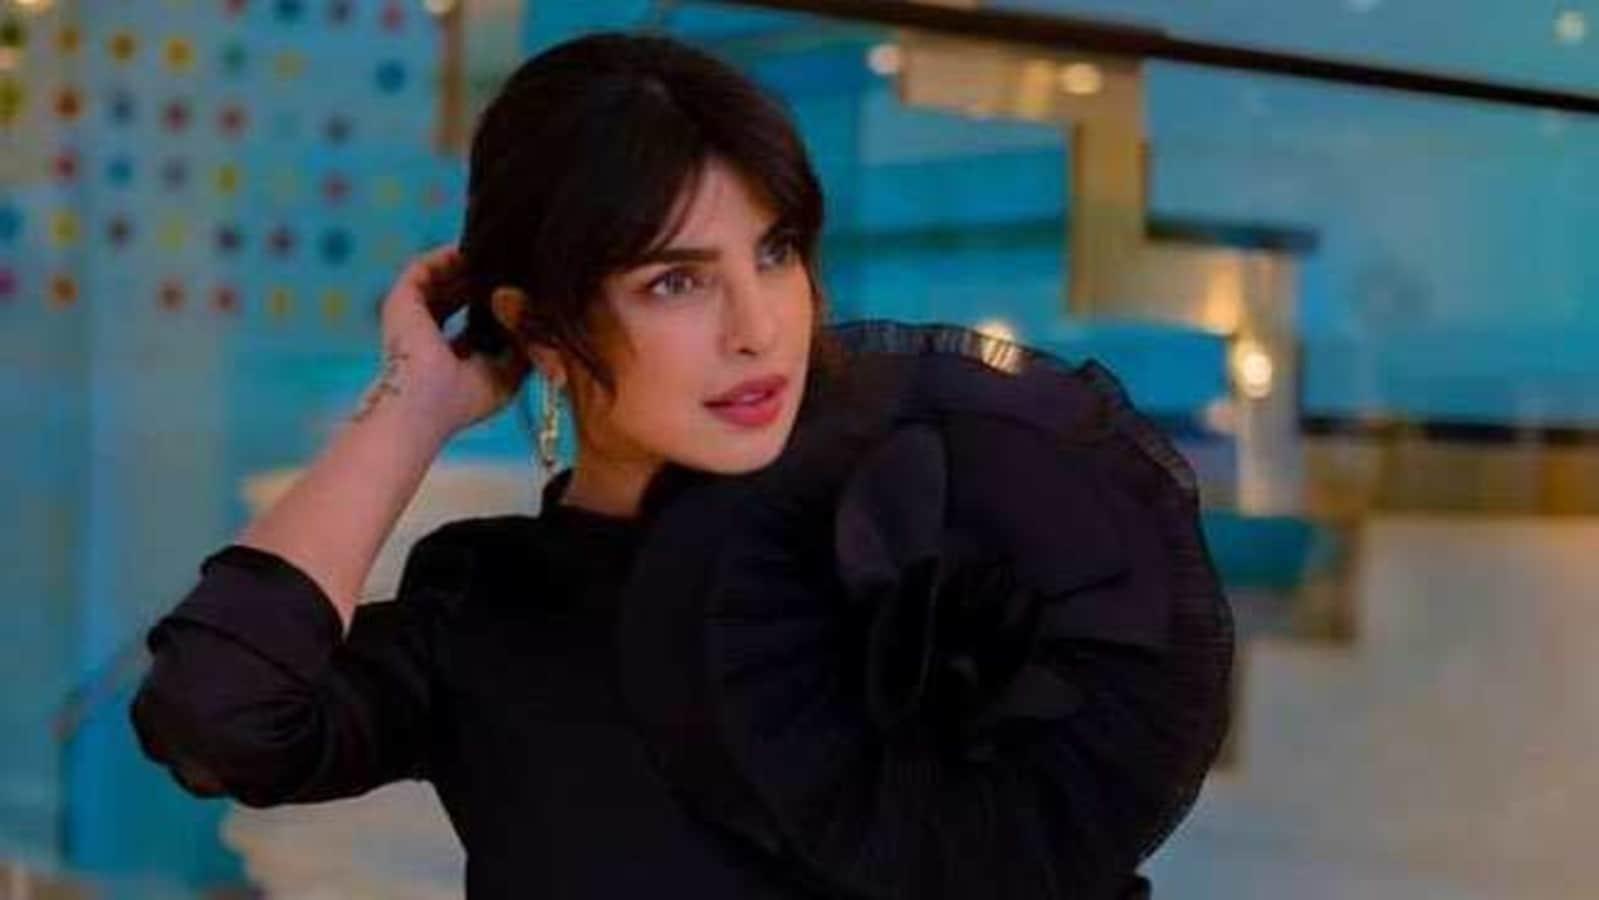 Russo Brothers call Priyanka Chopra 'incredible star', say she will be 'amazing' in Citadel - Hindustan Times